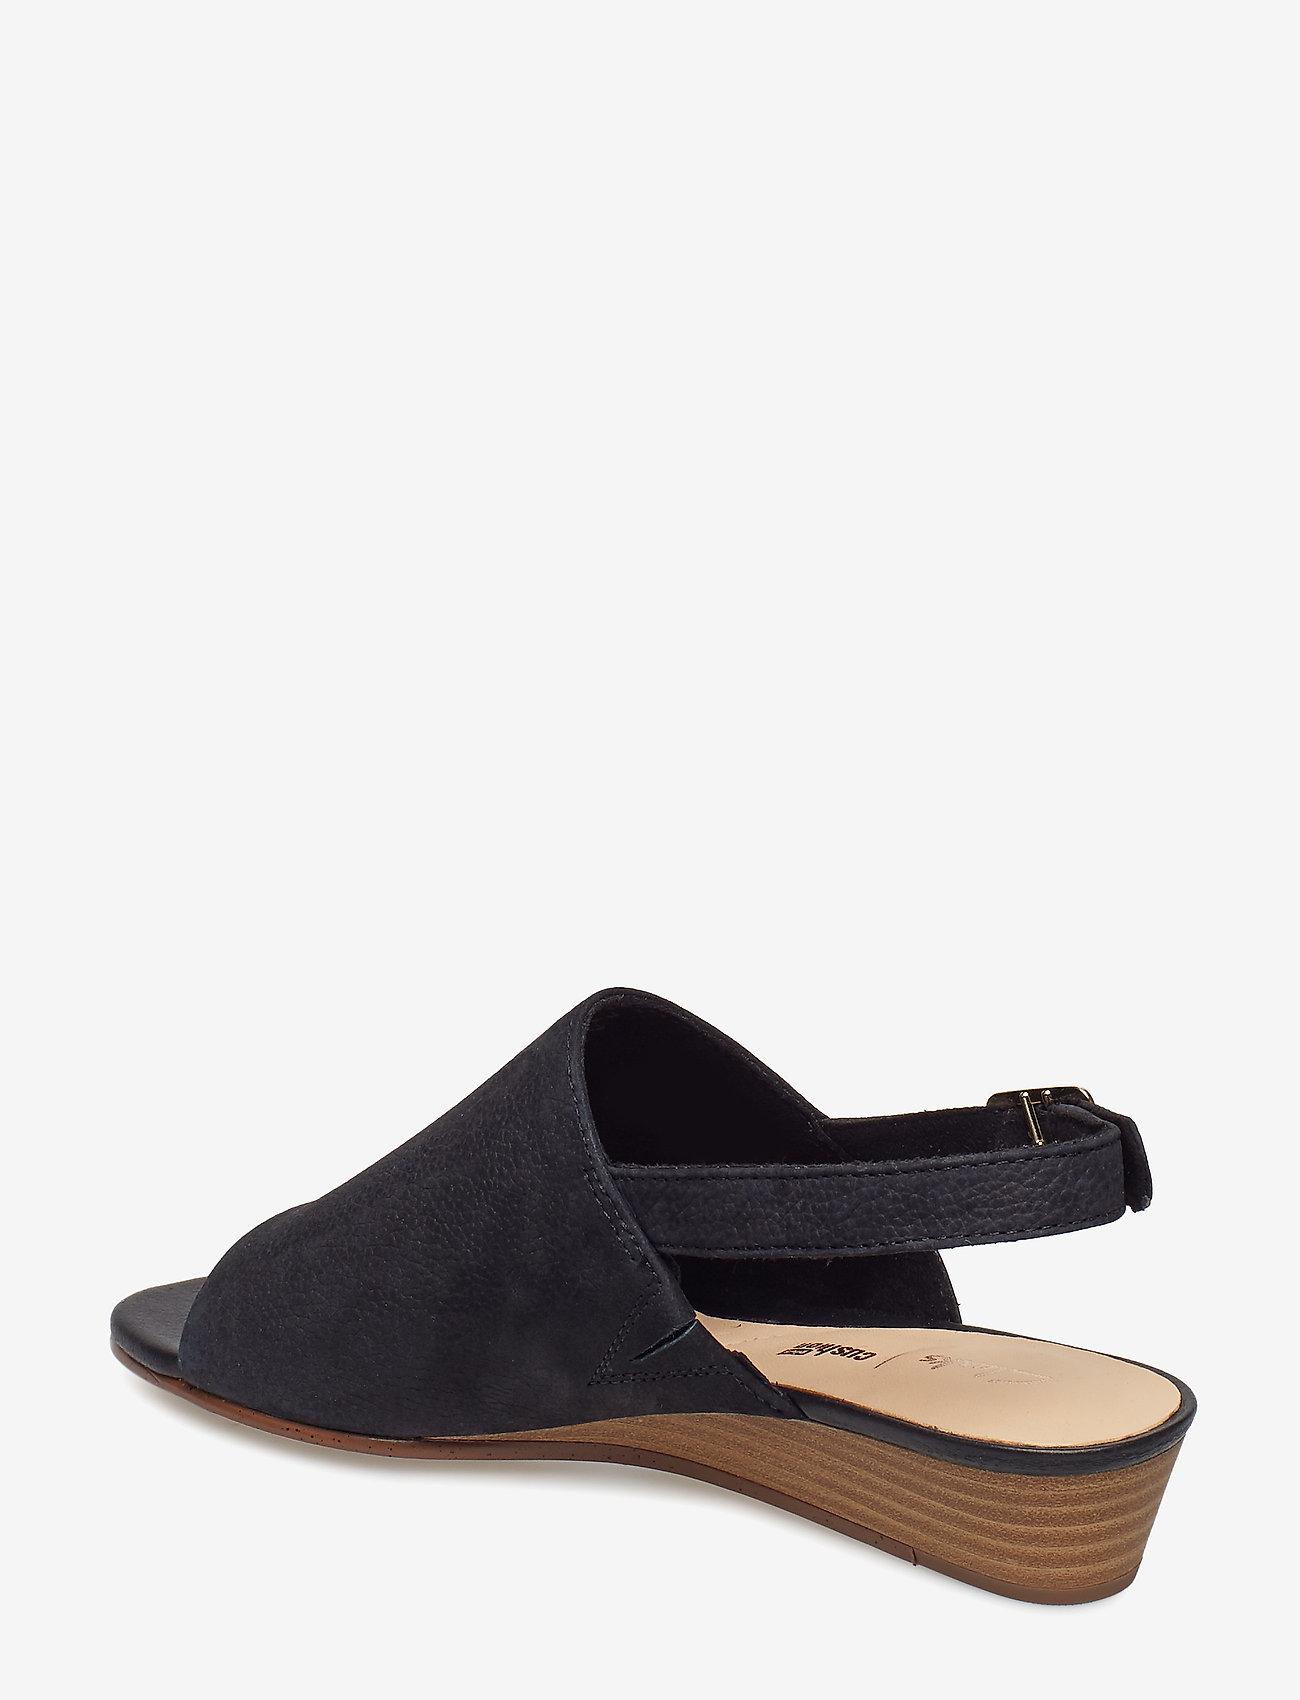 Clarks - Mena Lily - platta sandaler - black nubuck - 1